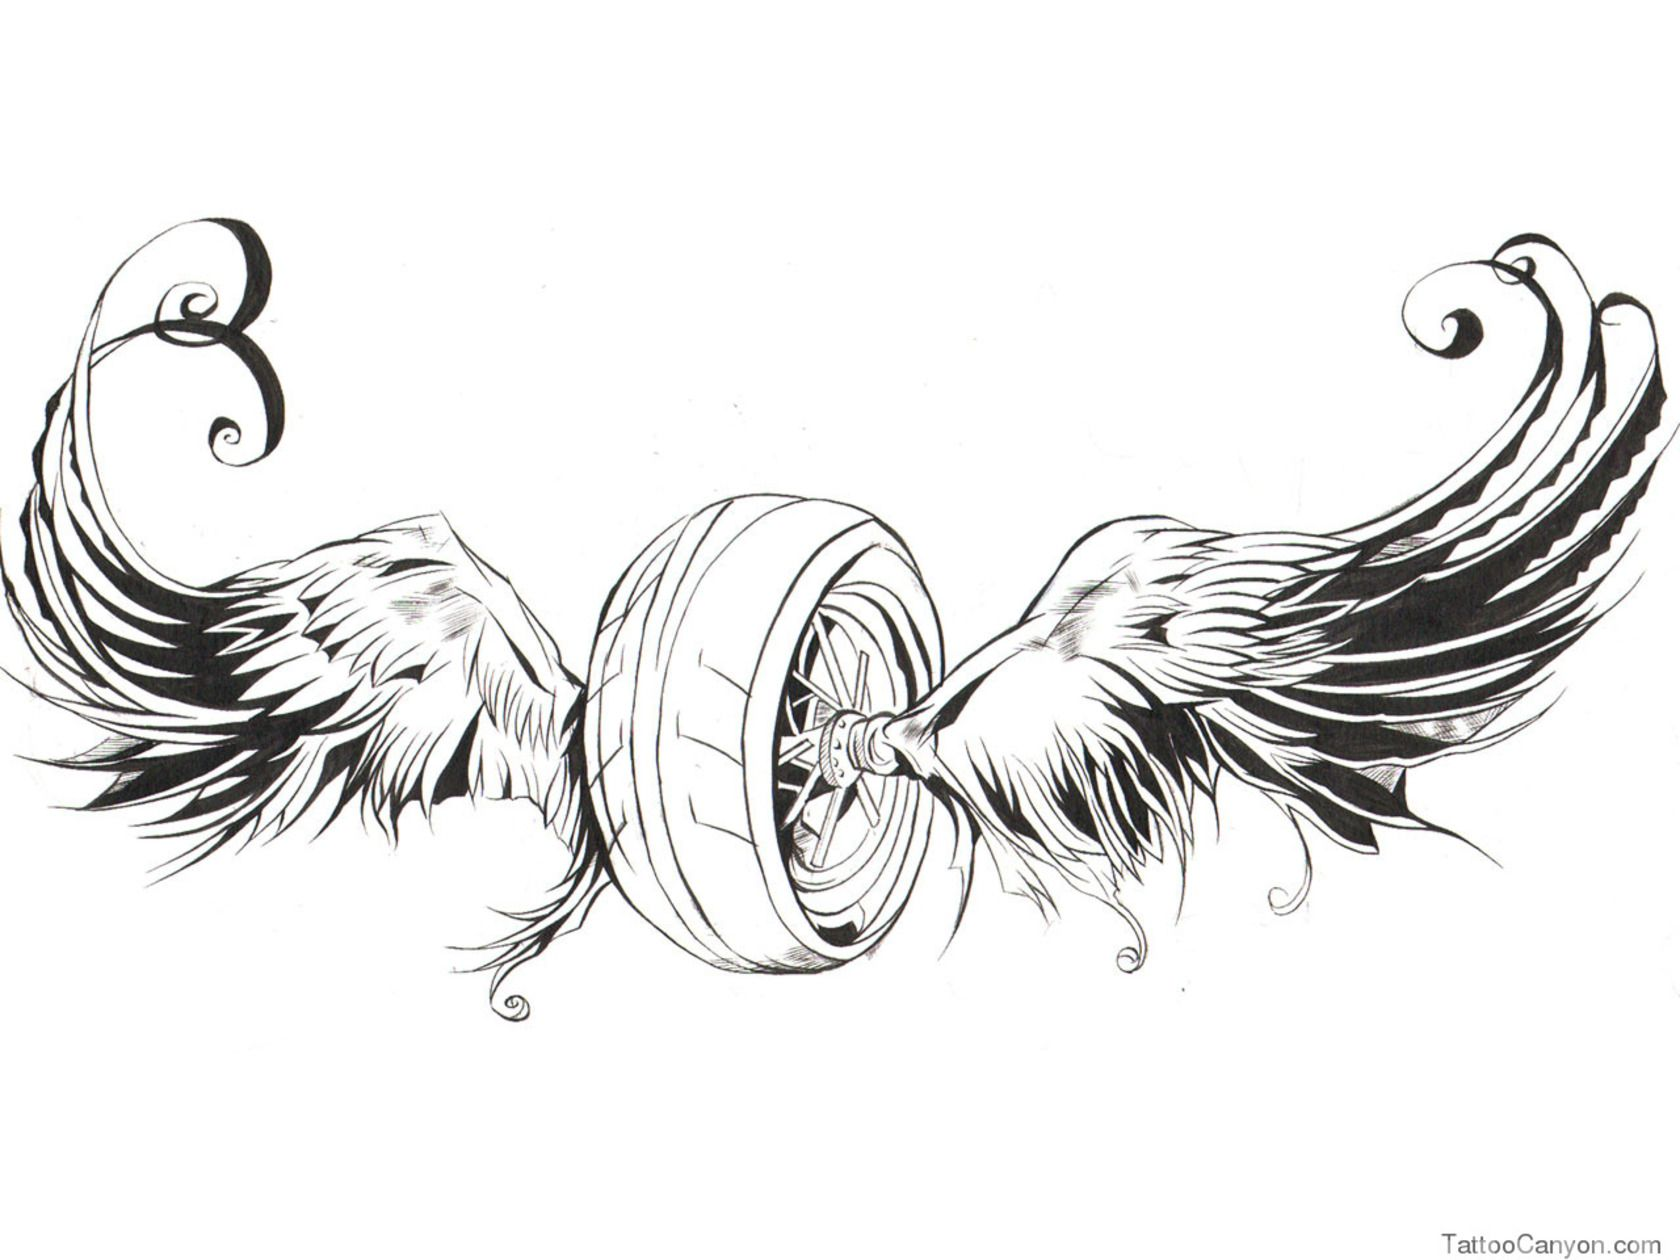 Tattoo S For Tribal Motorcycle Tattoo Biker Tattoos Motorcycle Tattoos Dad Tattoos